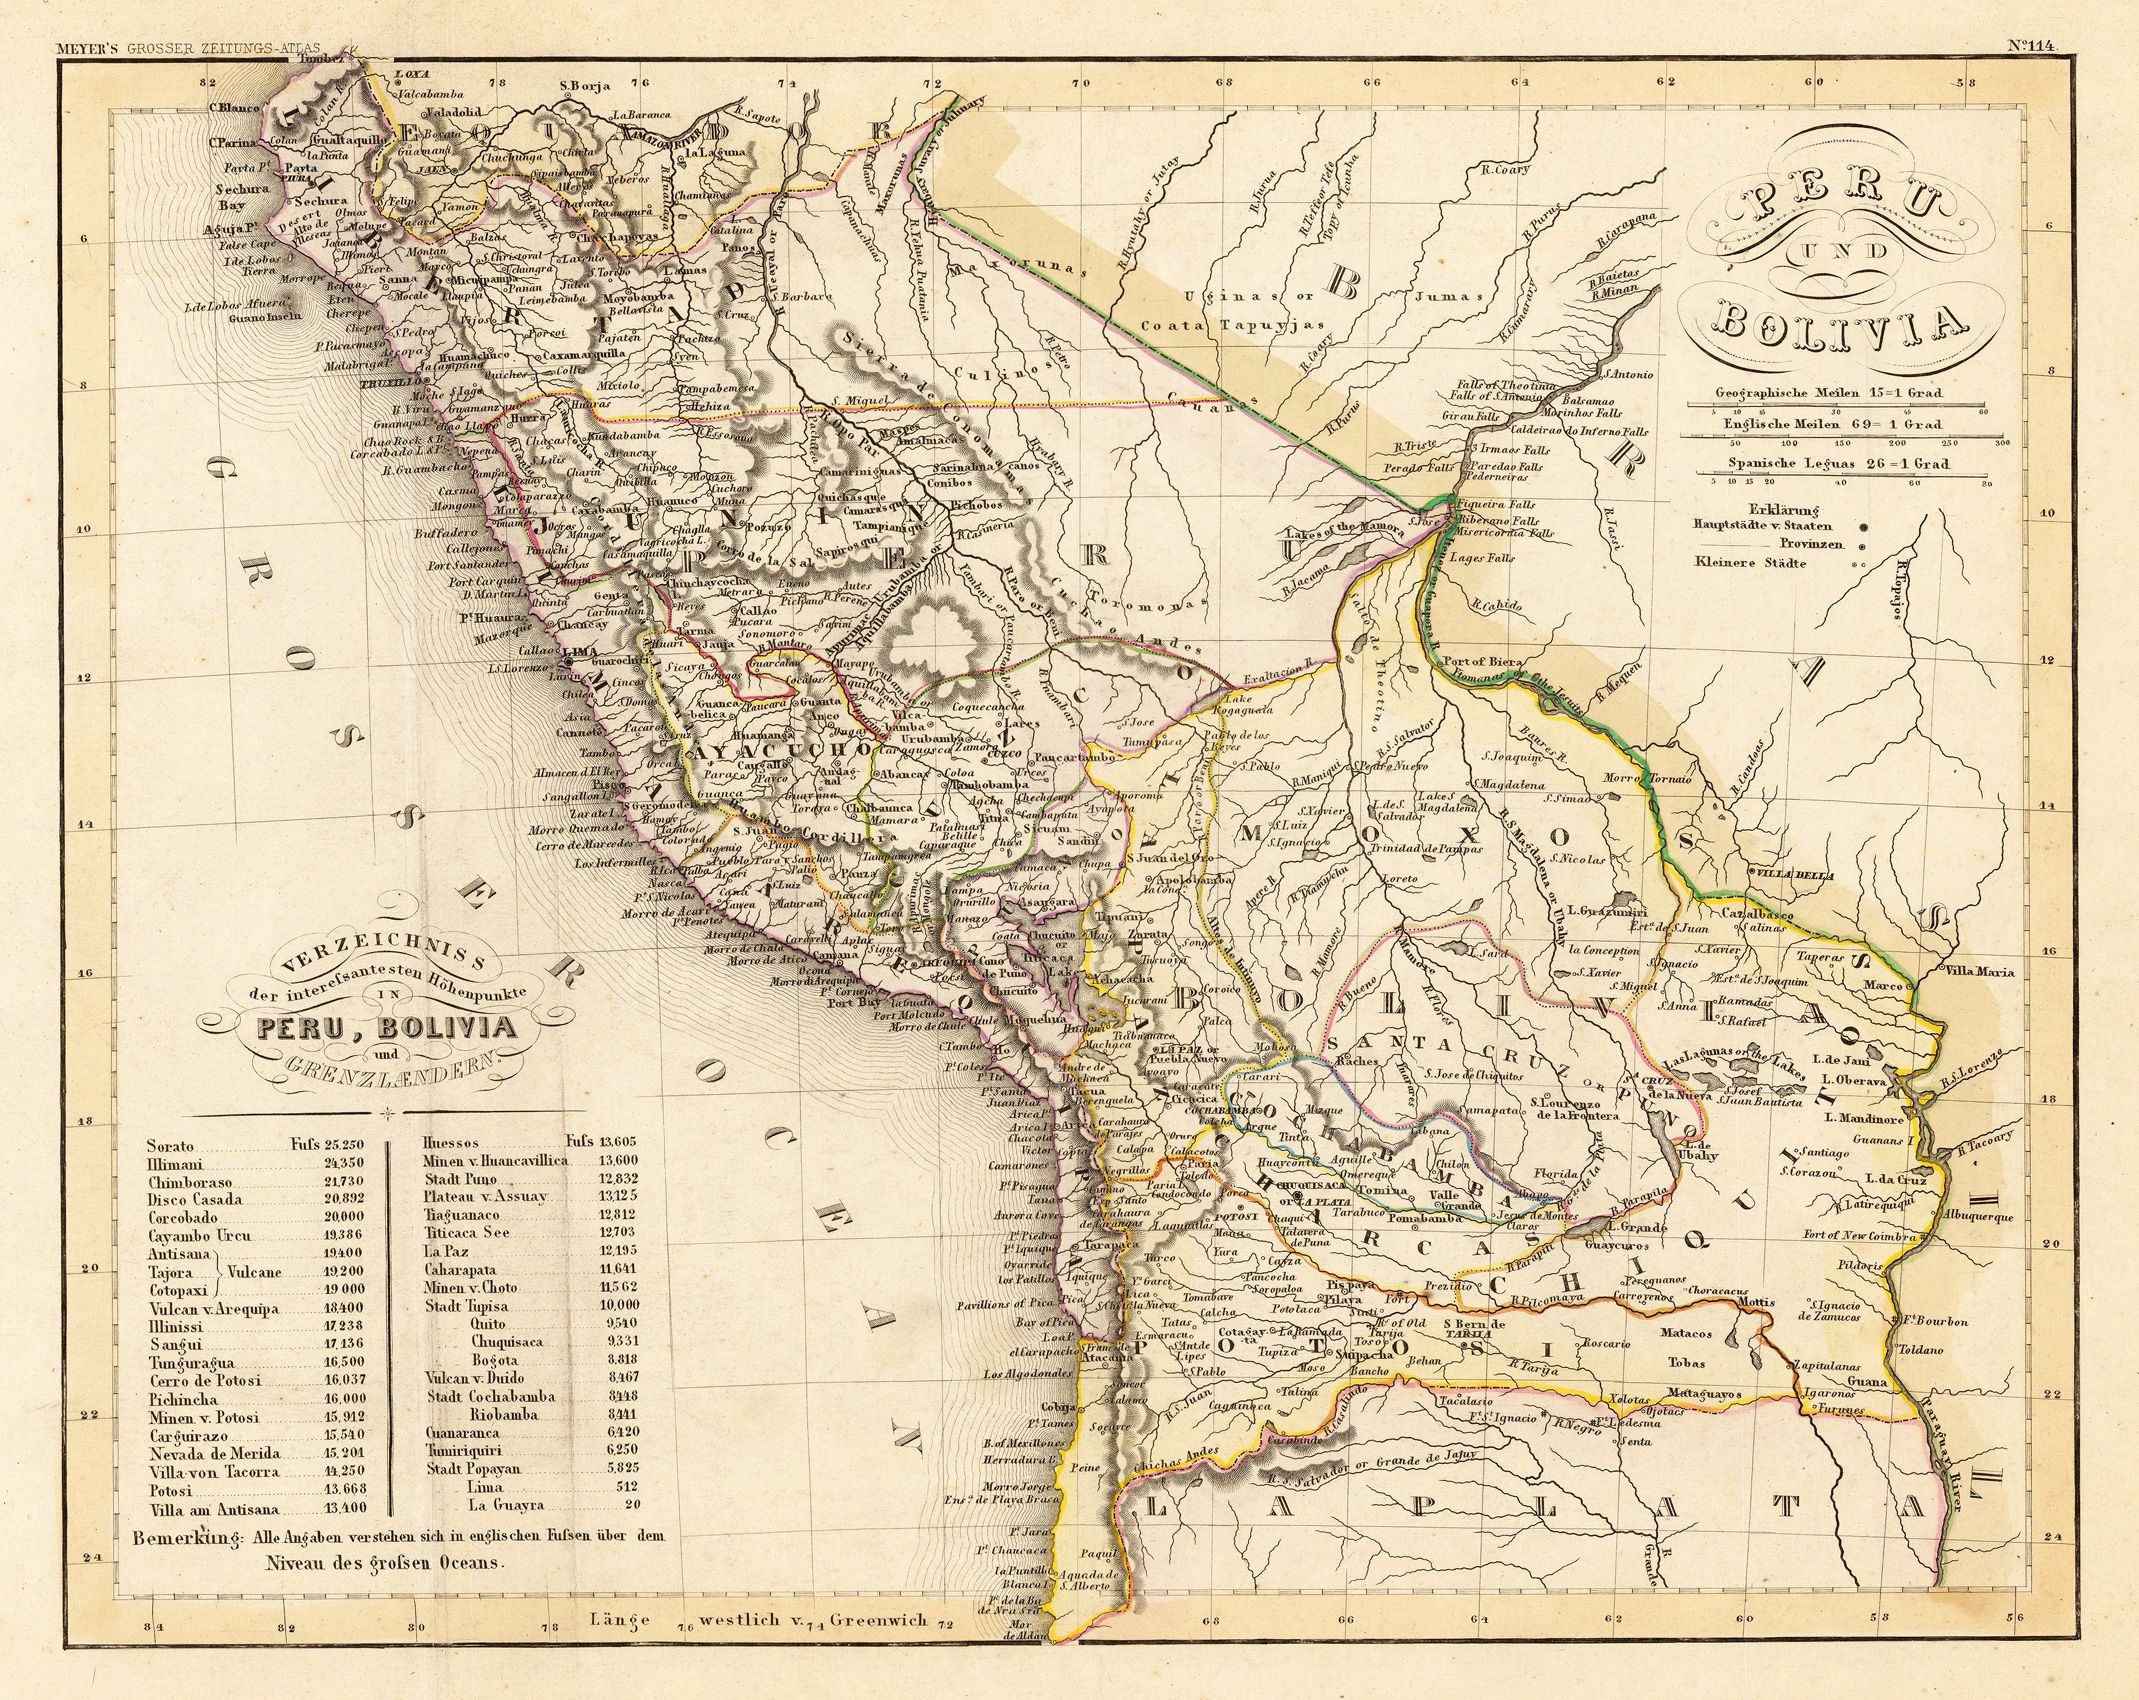 Basic Grades 9 10 Map Of Peru